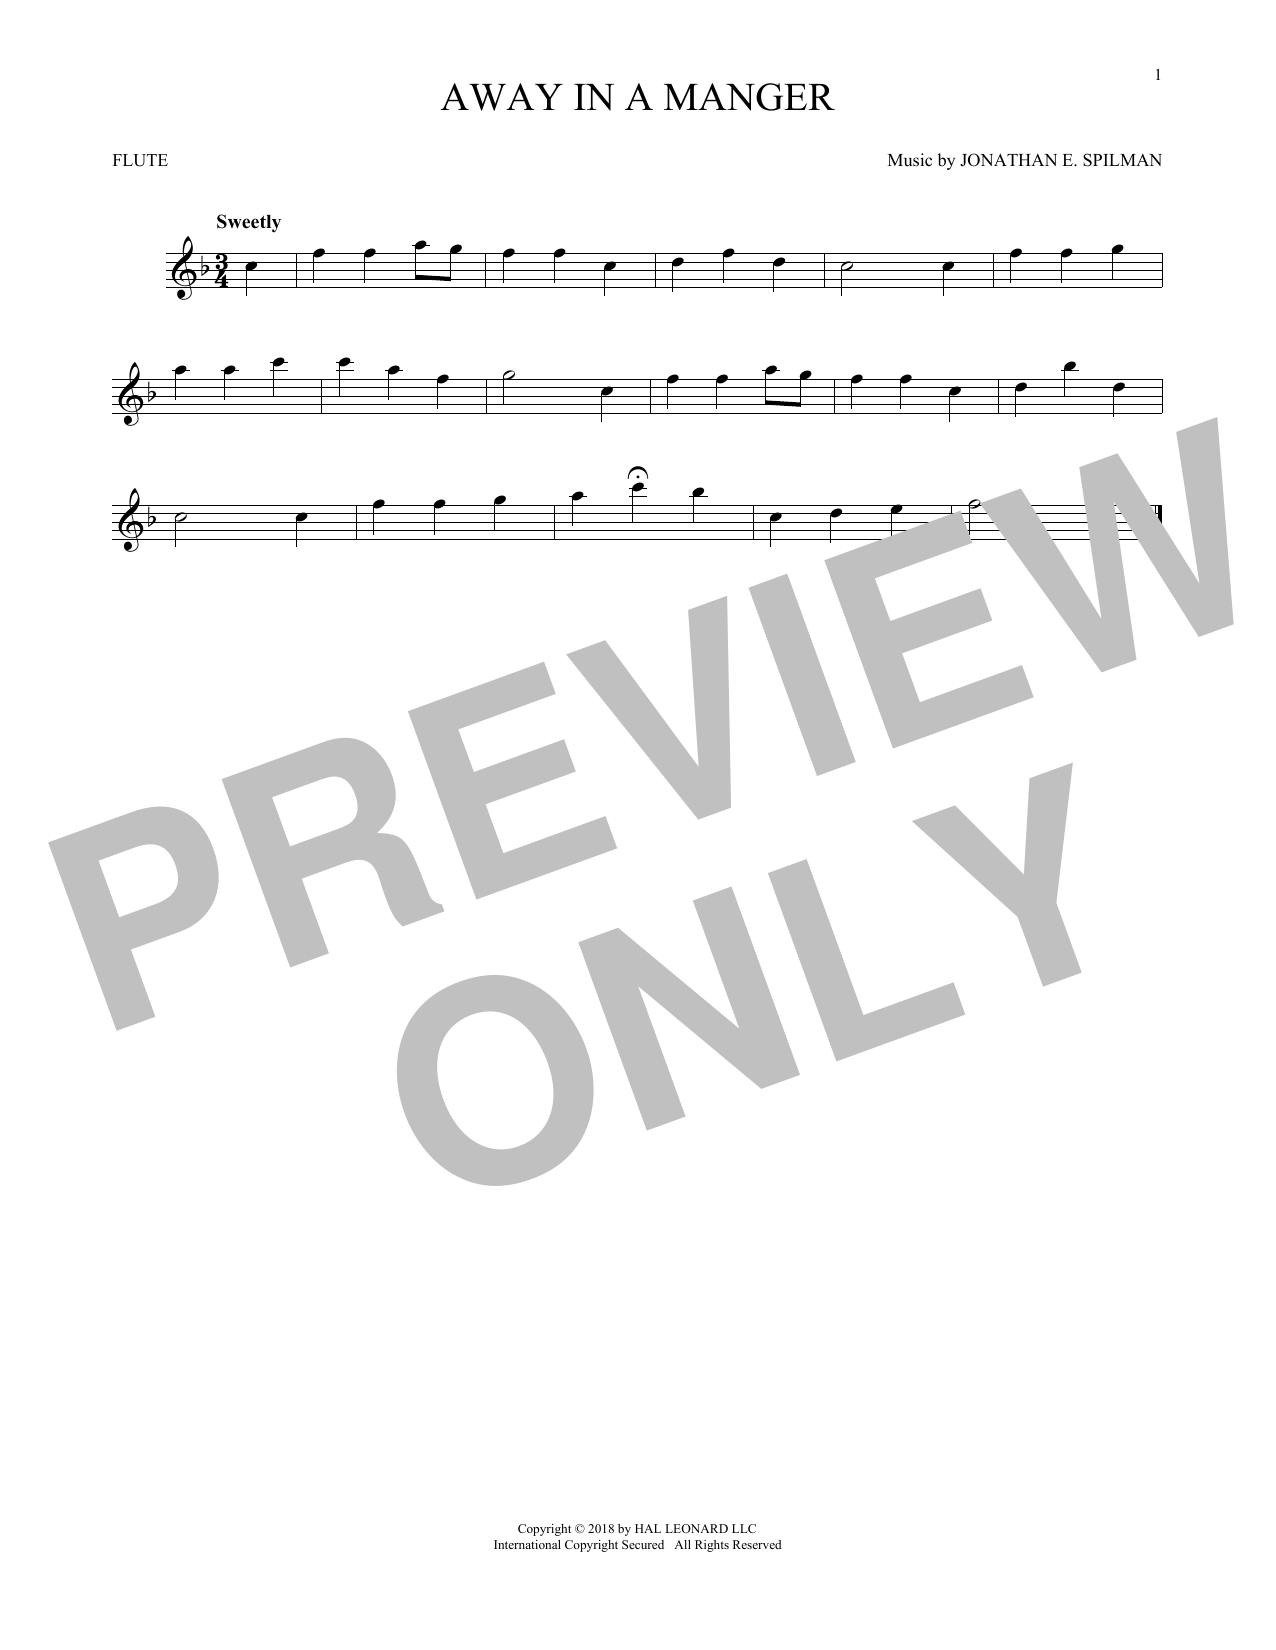 Away In A Manger (Flute Solo)